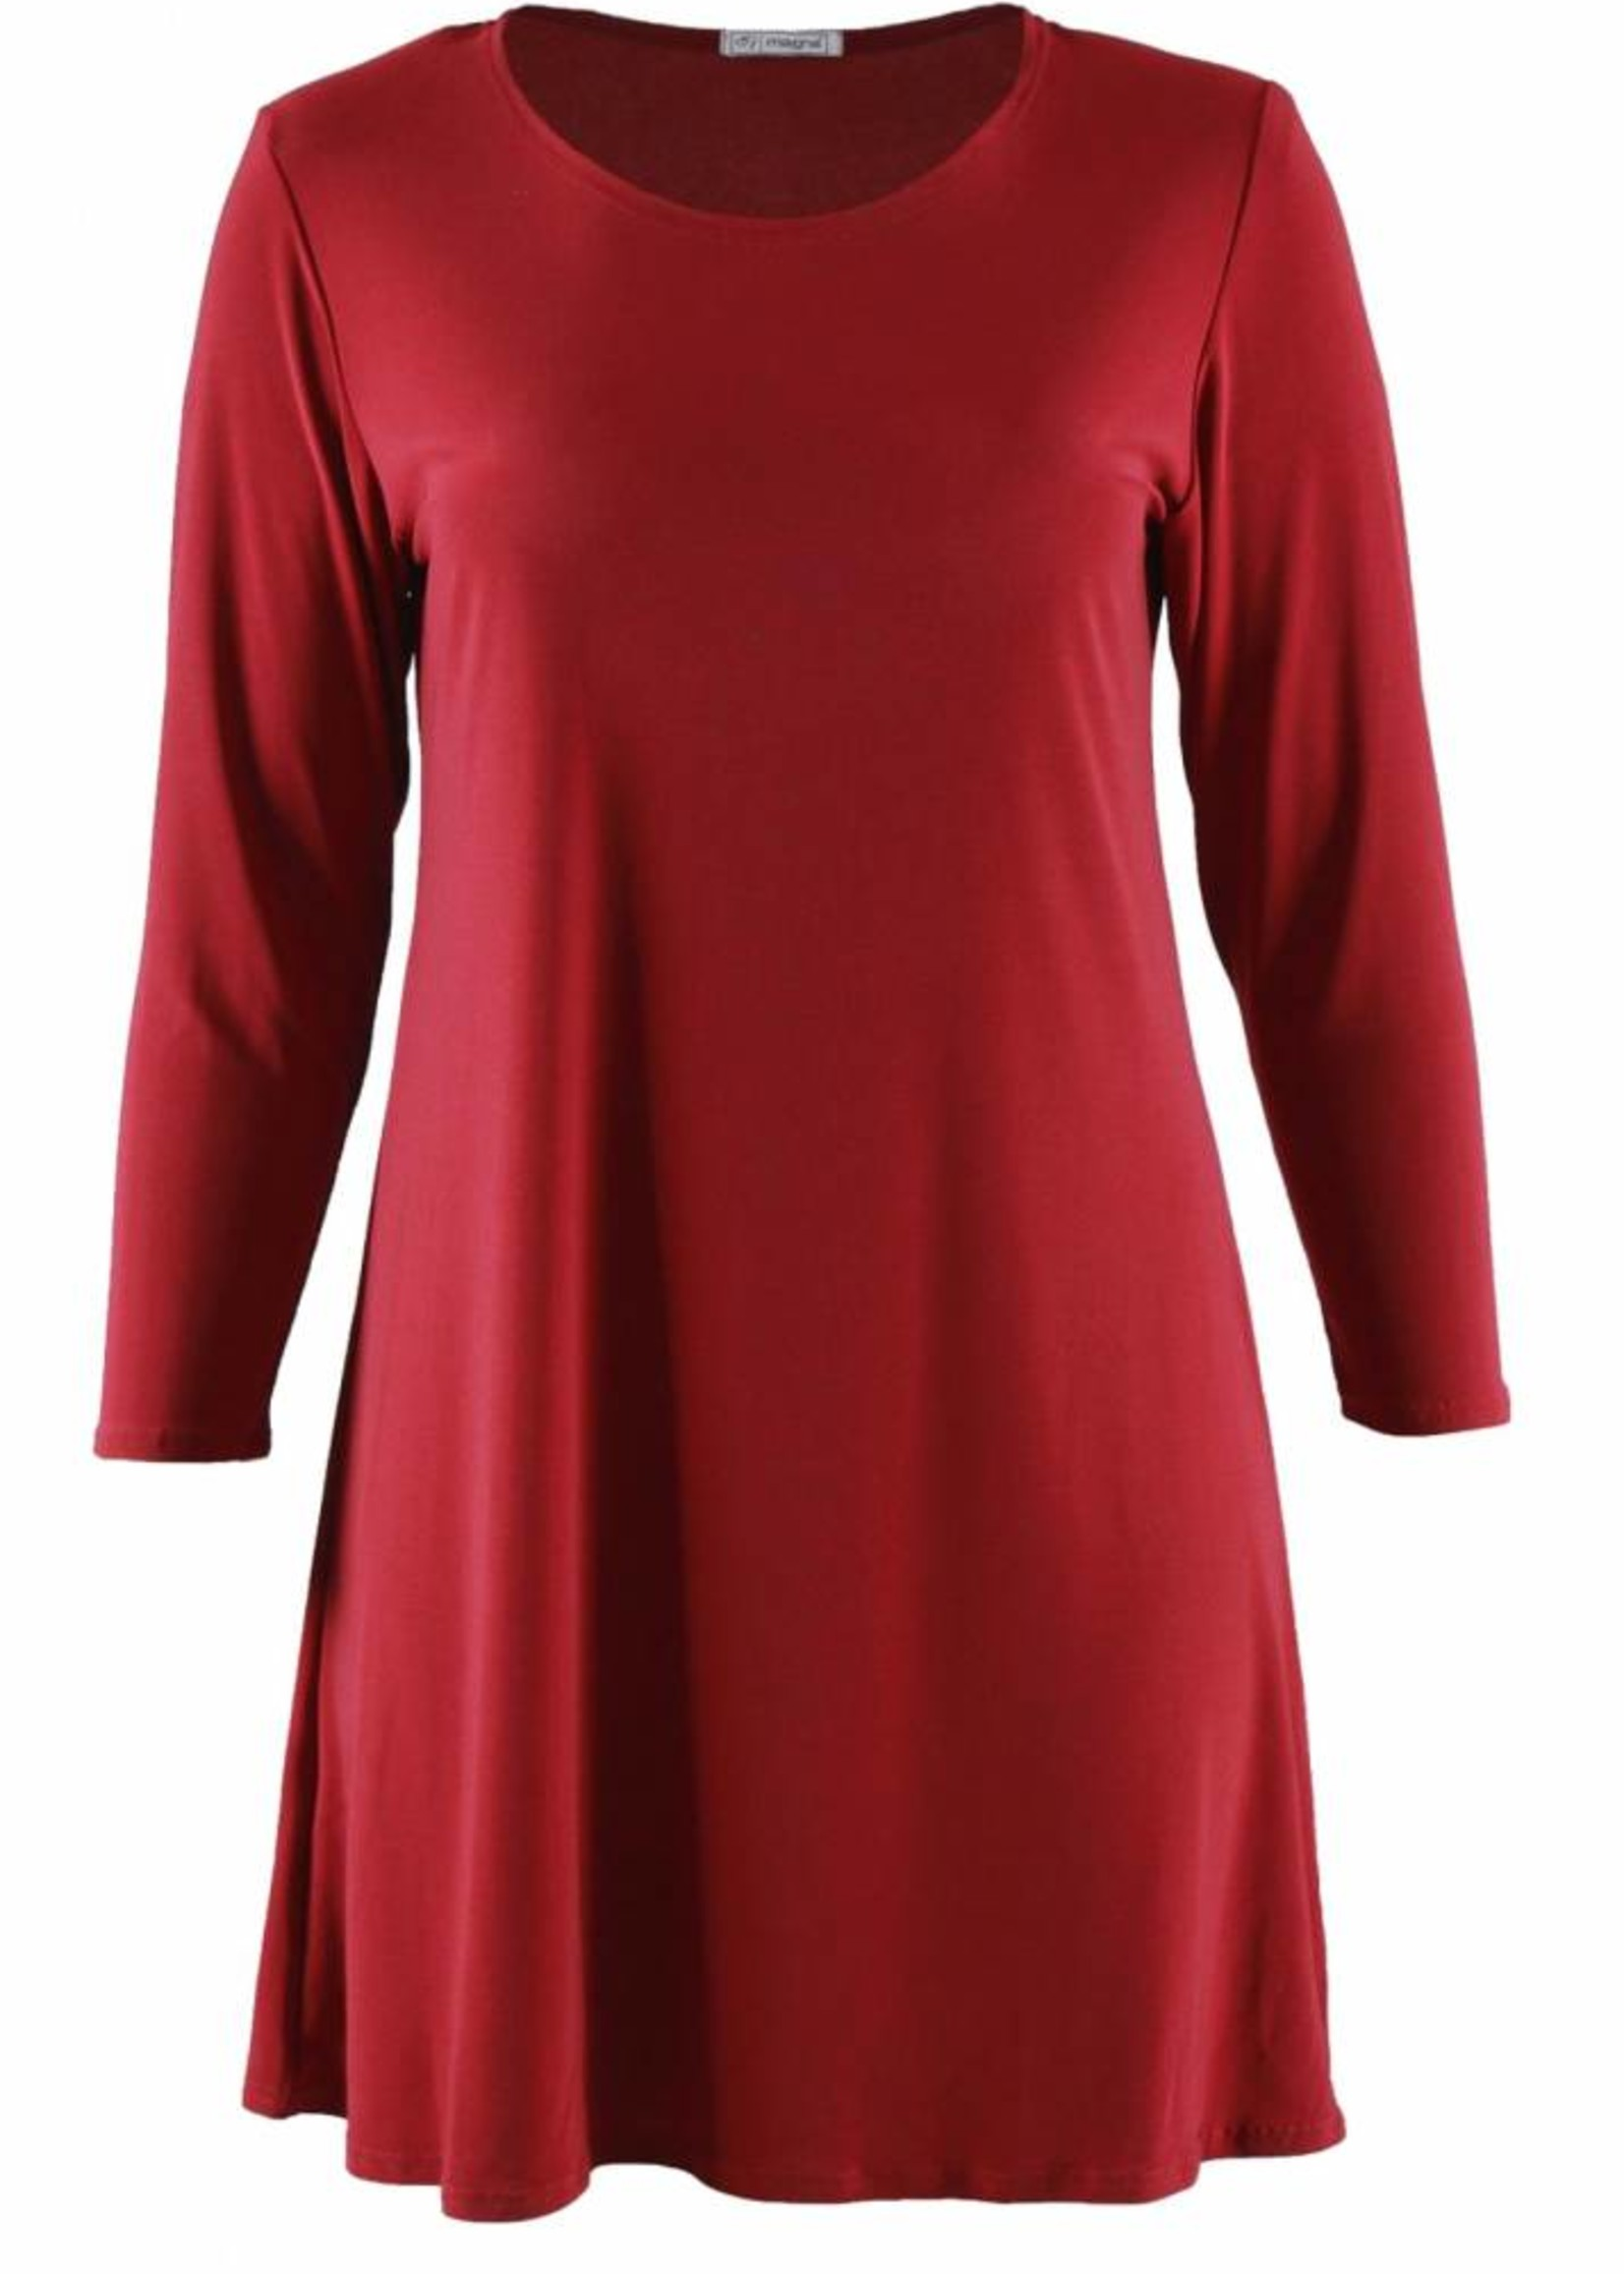 Magna Fashion Tuniek C101 SOLID WINTER